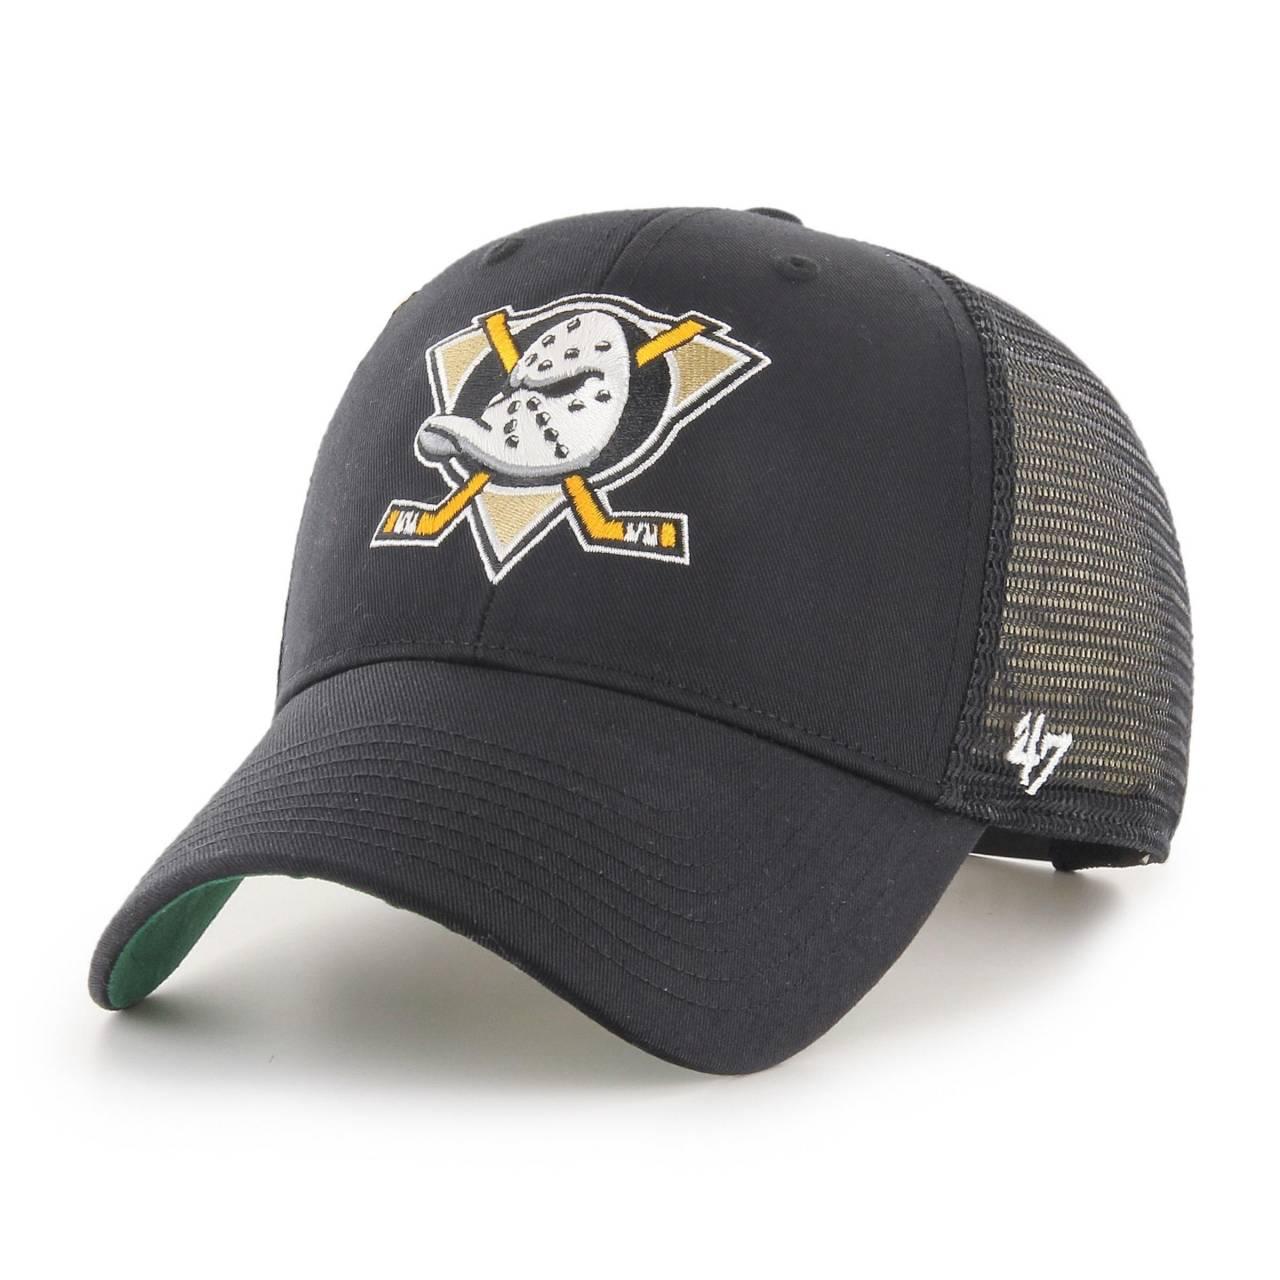 NHL ANAHEIM DUCKS BRANSON '47 MVP BLACK CAP